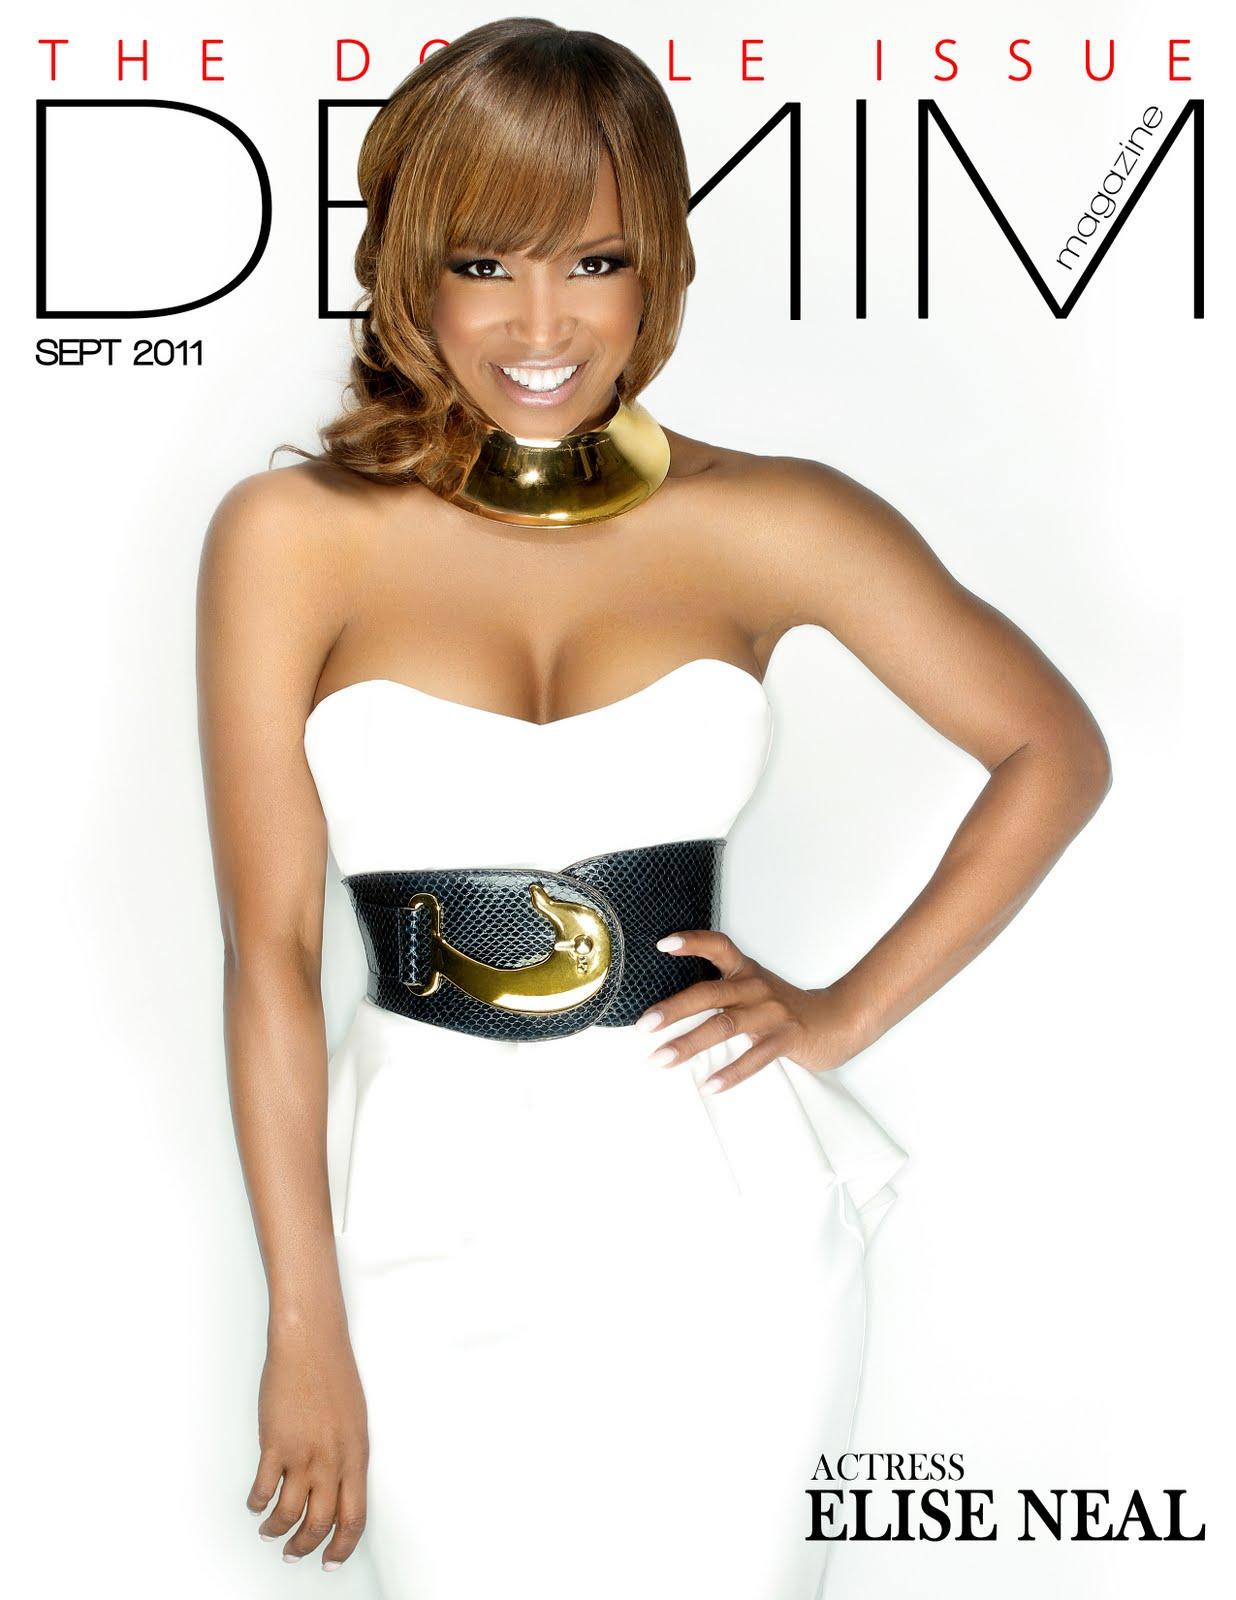 http://1.bp.blogspot.com/-FiAq7B5FHZg/Tl3n4sLj4VI/AAAAAAAAY-c/7TK7CxNle8E/s1600/elise_neal_denim_magazine_timodelle.JPG